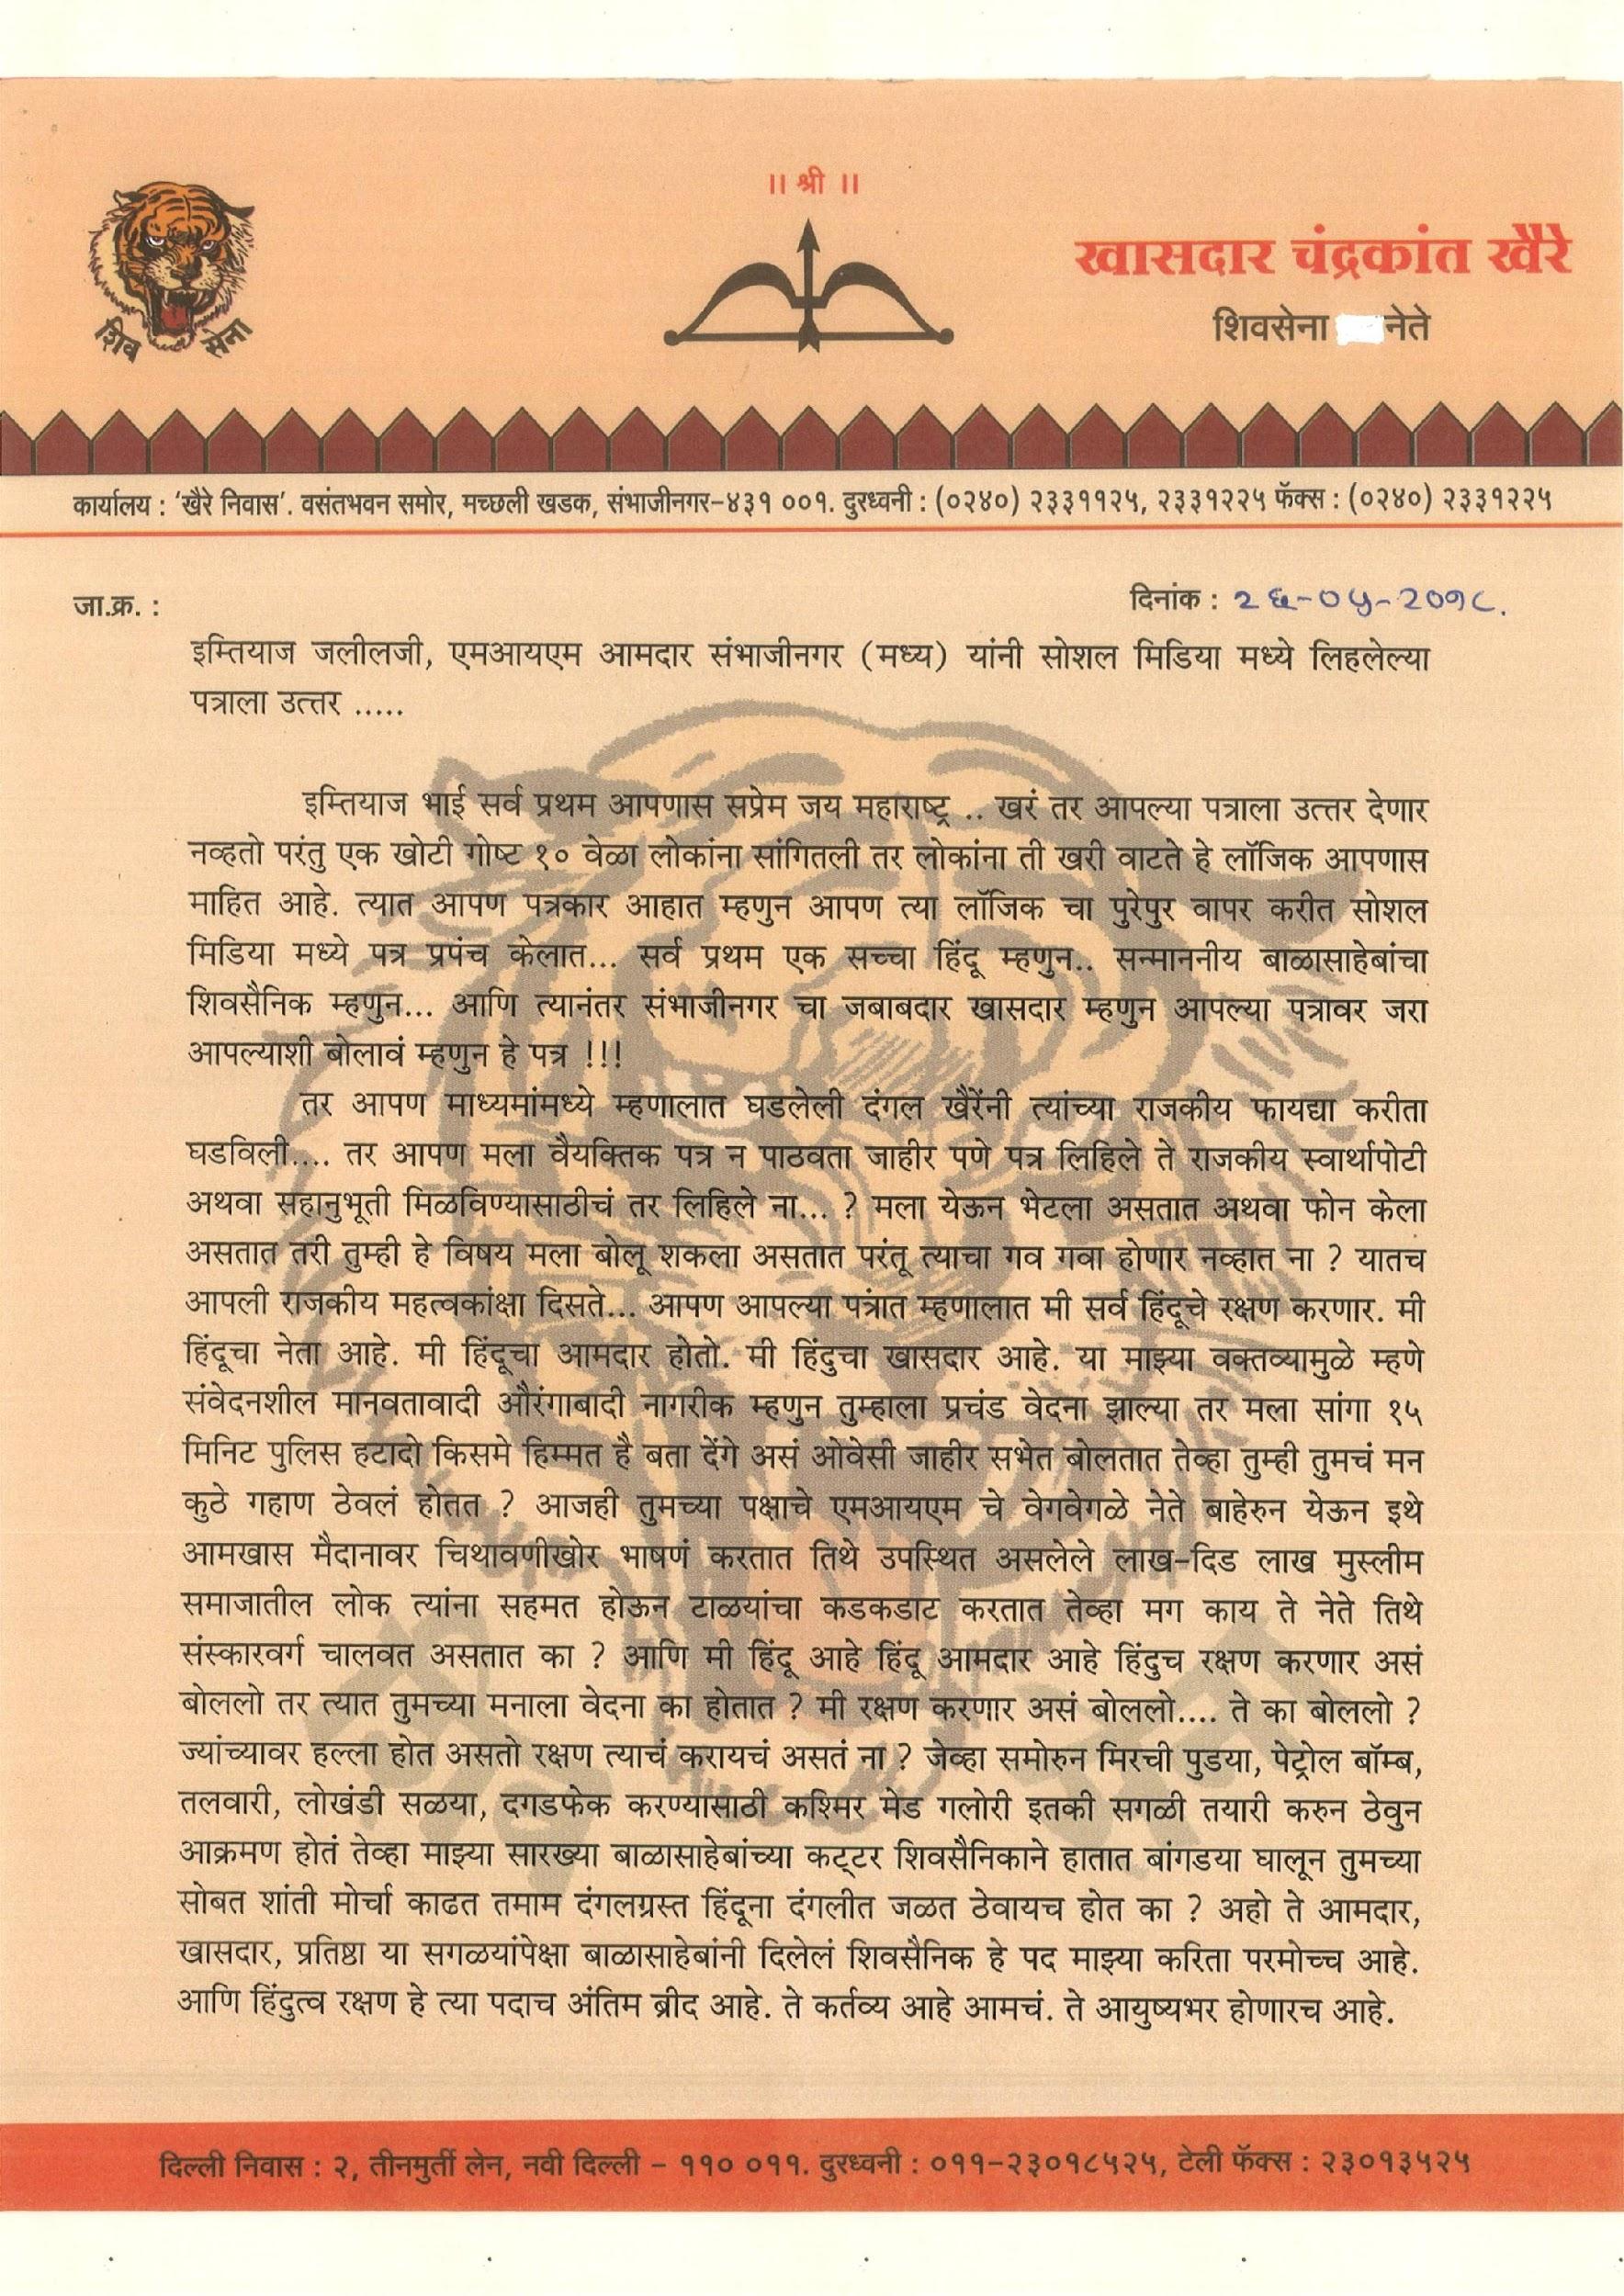 Chandrakant Khaire reply to Imtiaz Jaleel 1 inmarathi